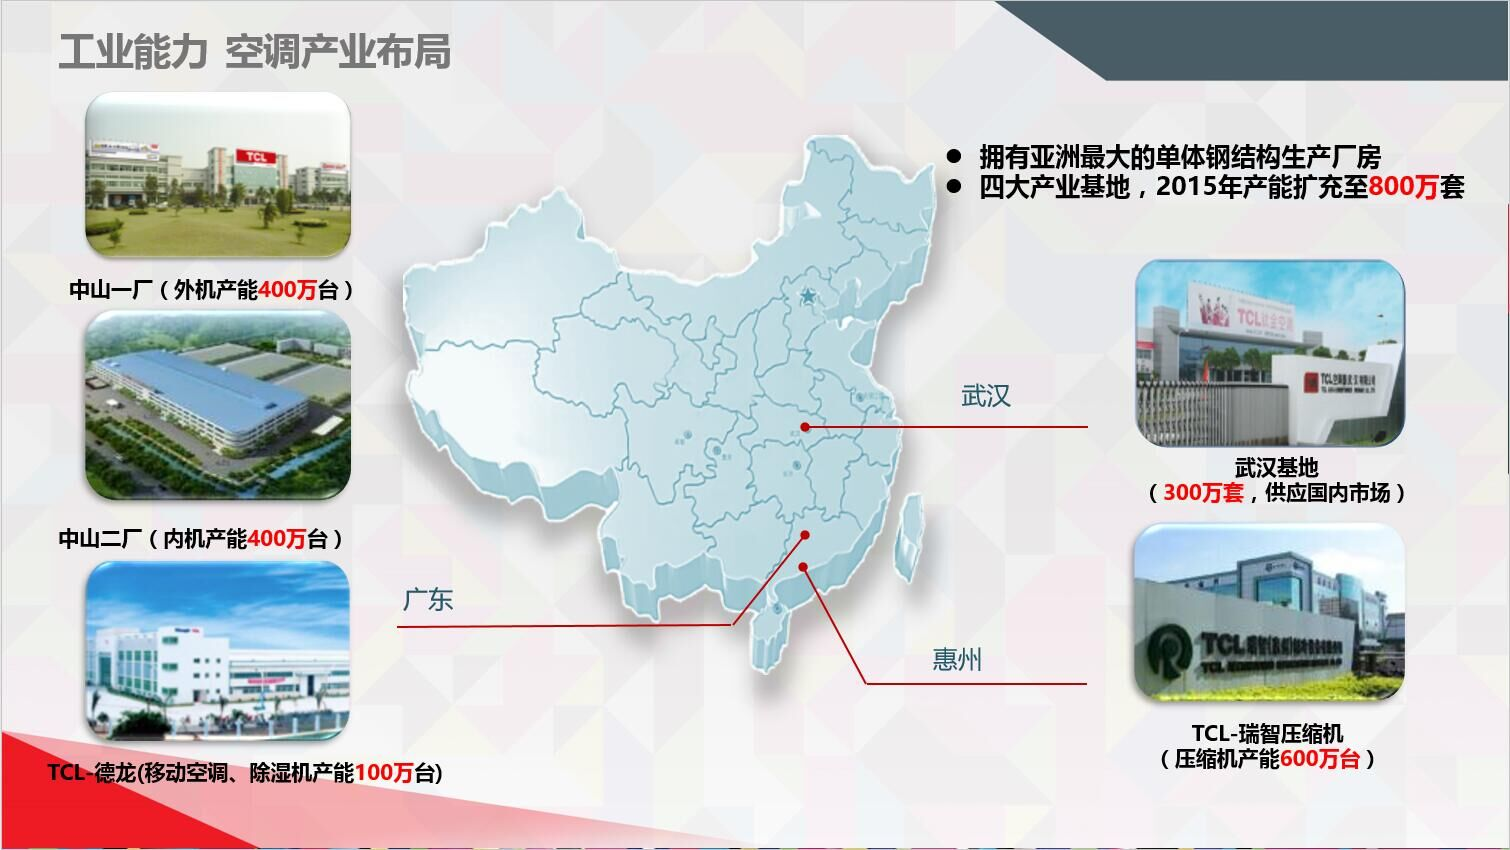 TCL空调器(中山)有限公司招聘